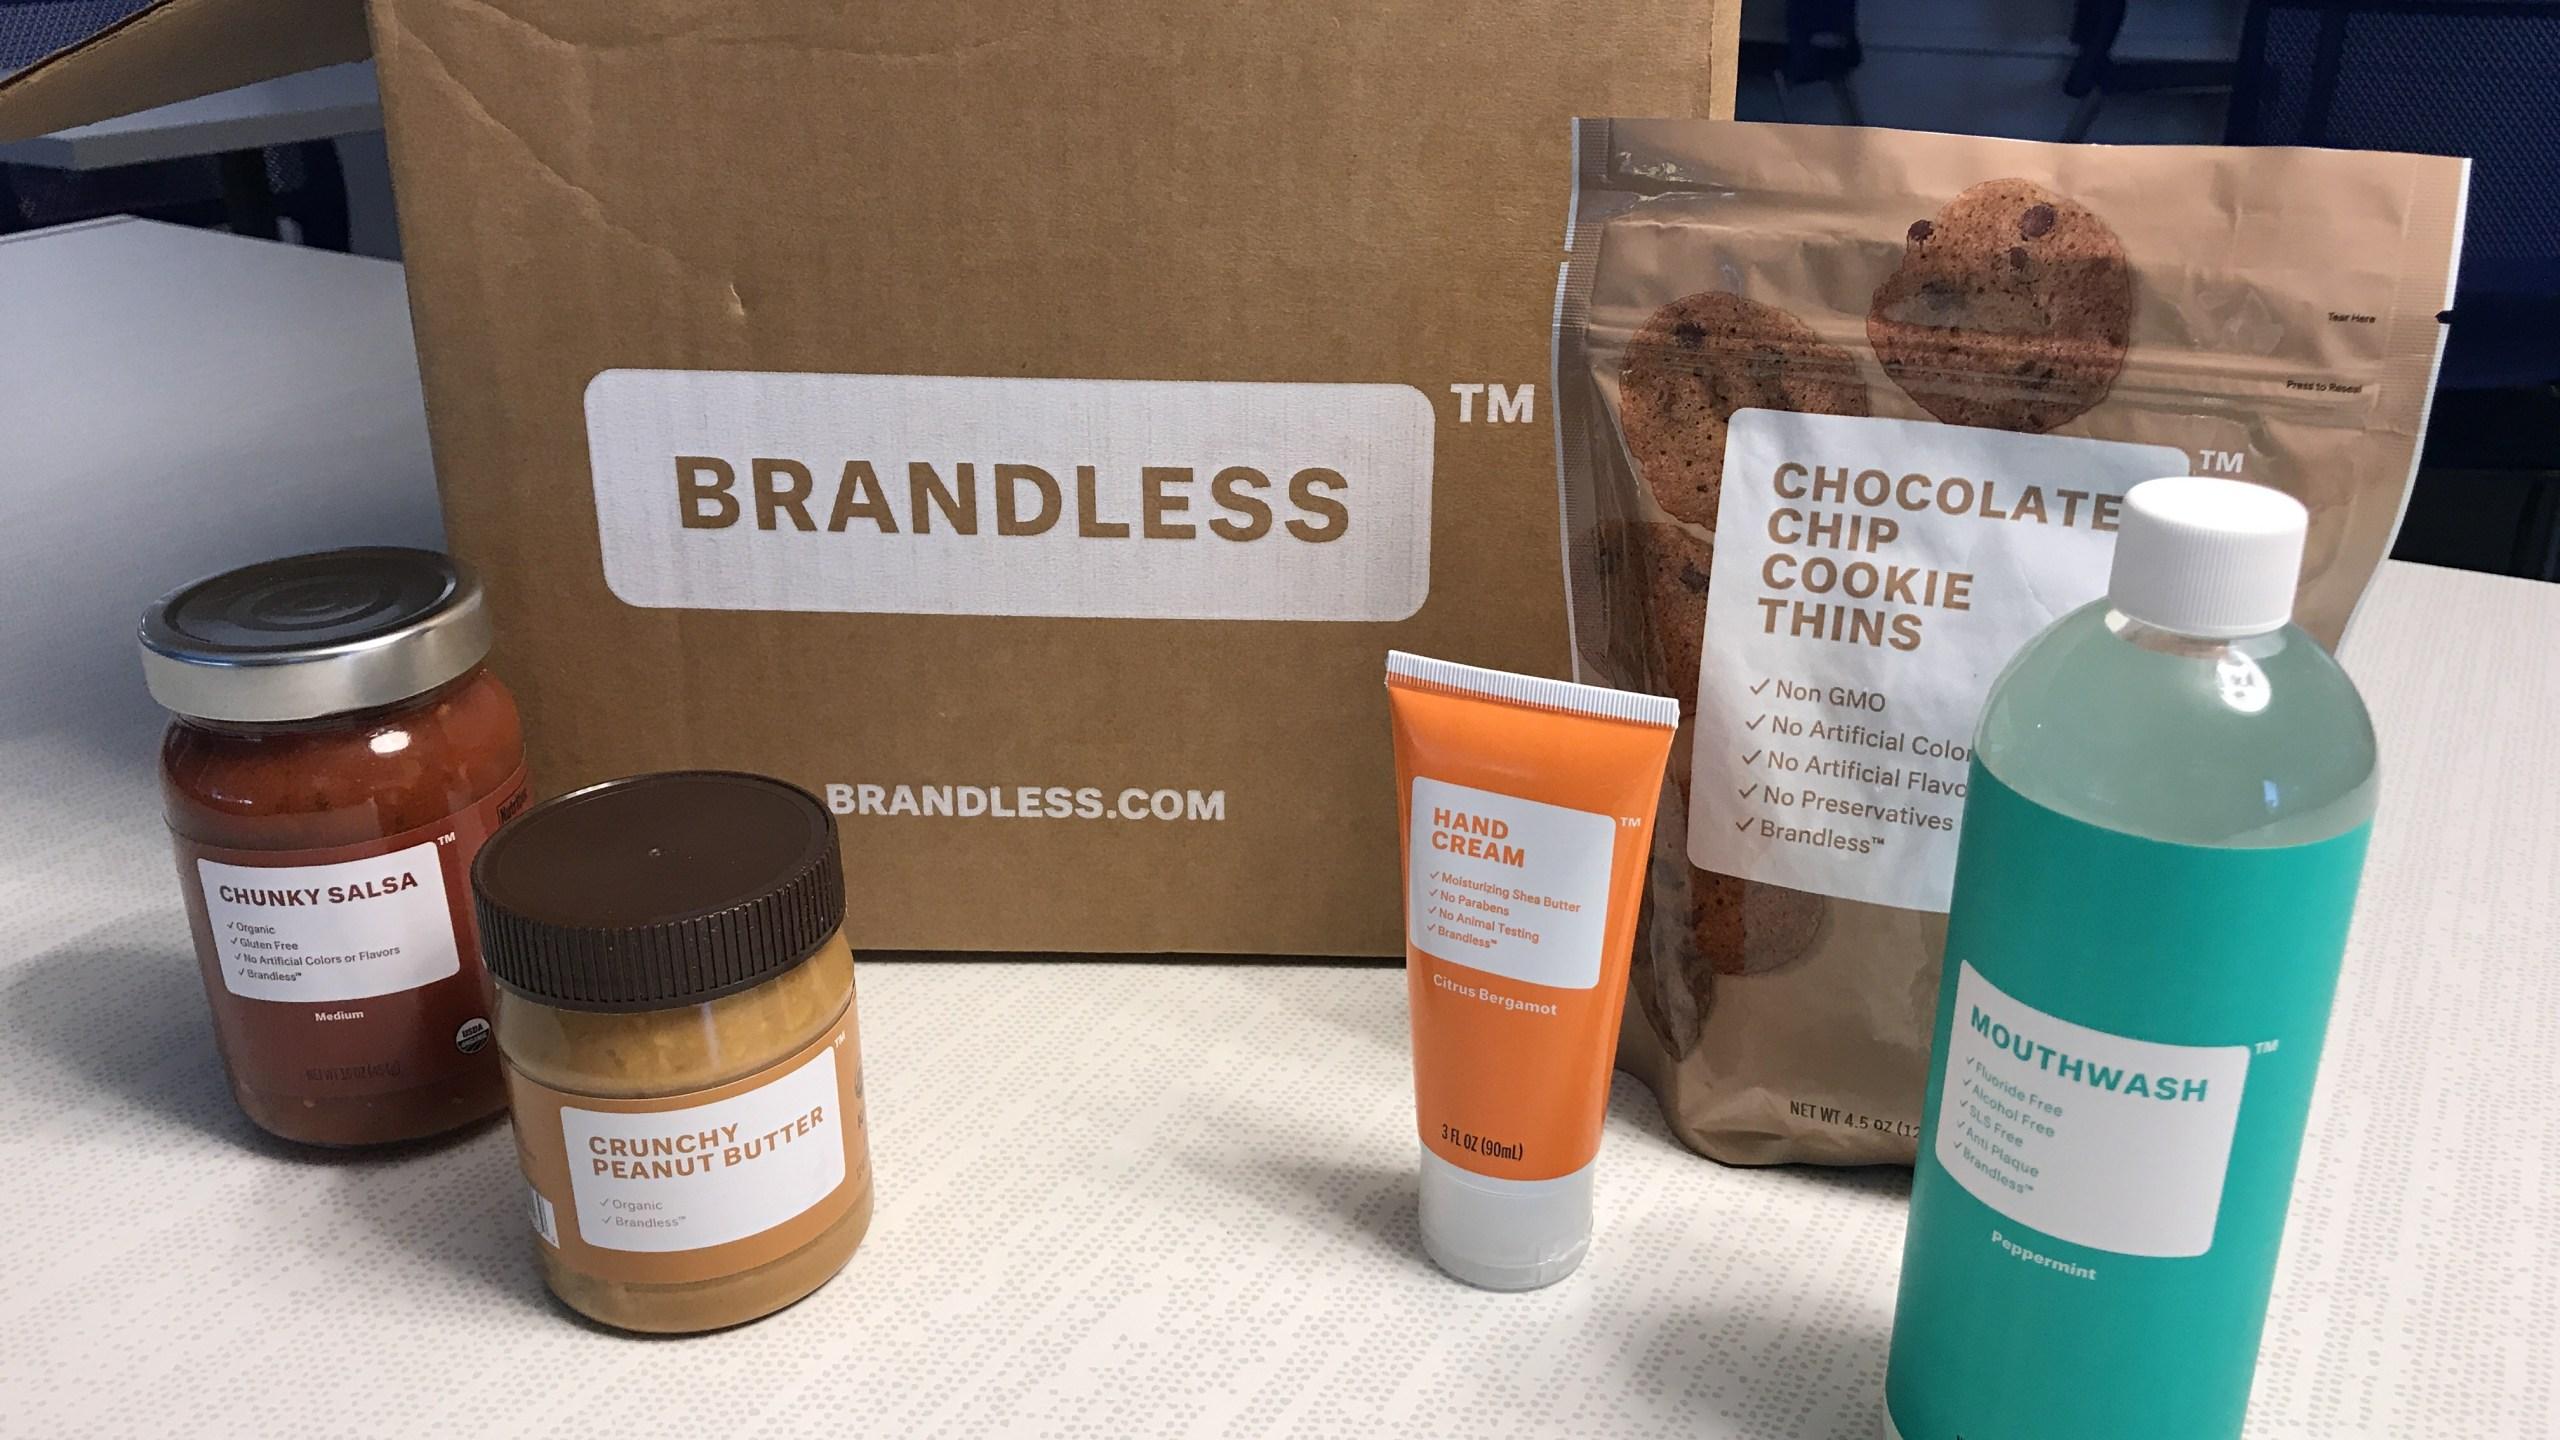 brandless review 2017